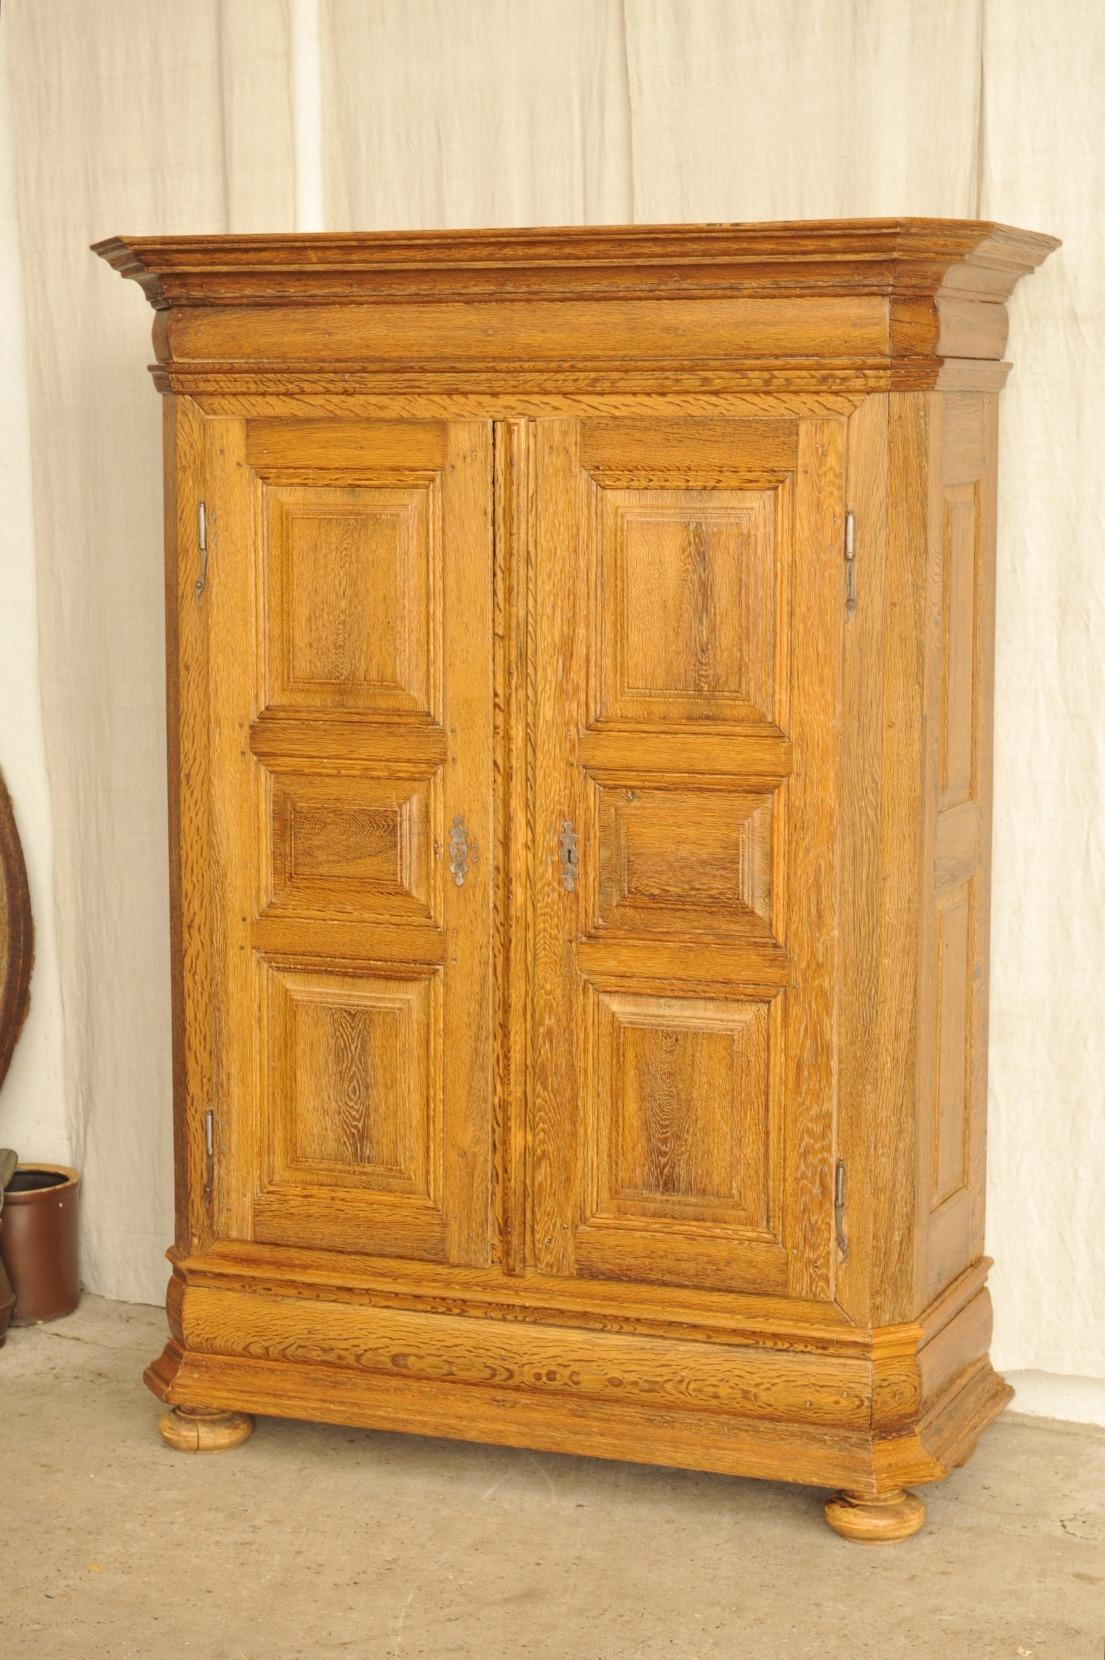 barockschrank eiche zerlegbar antik im hof. Black Bedroom Furniture Sets. Home Design Ideas